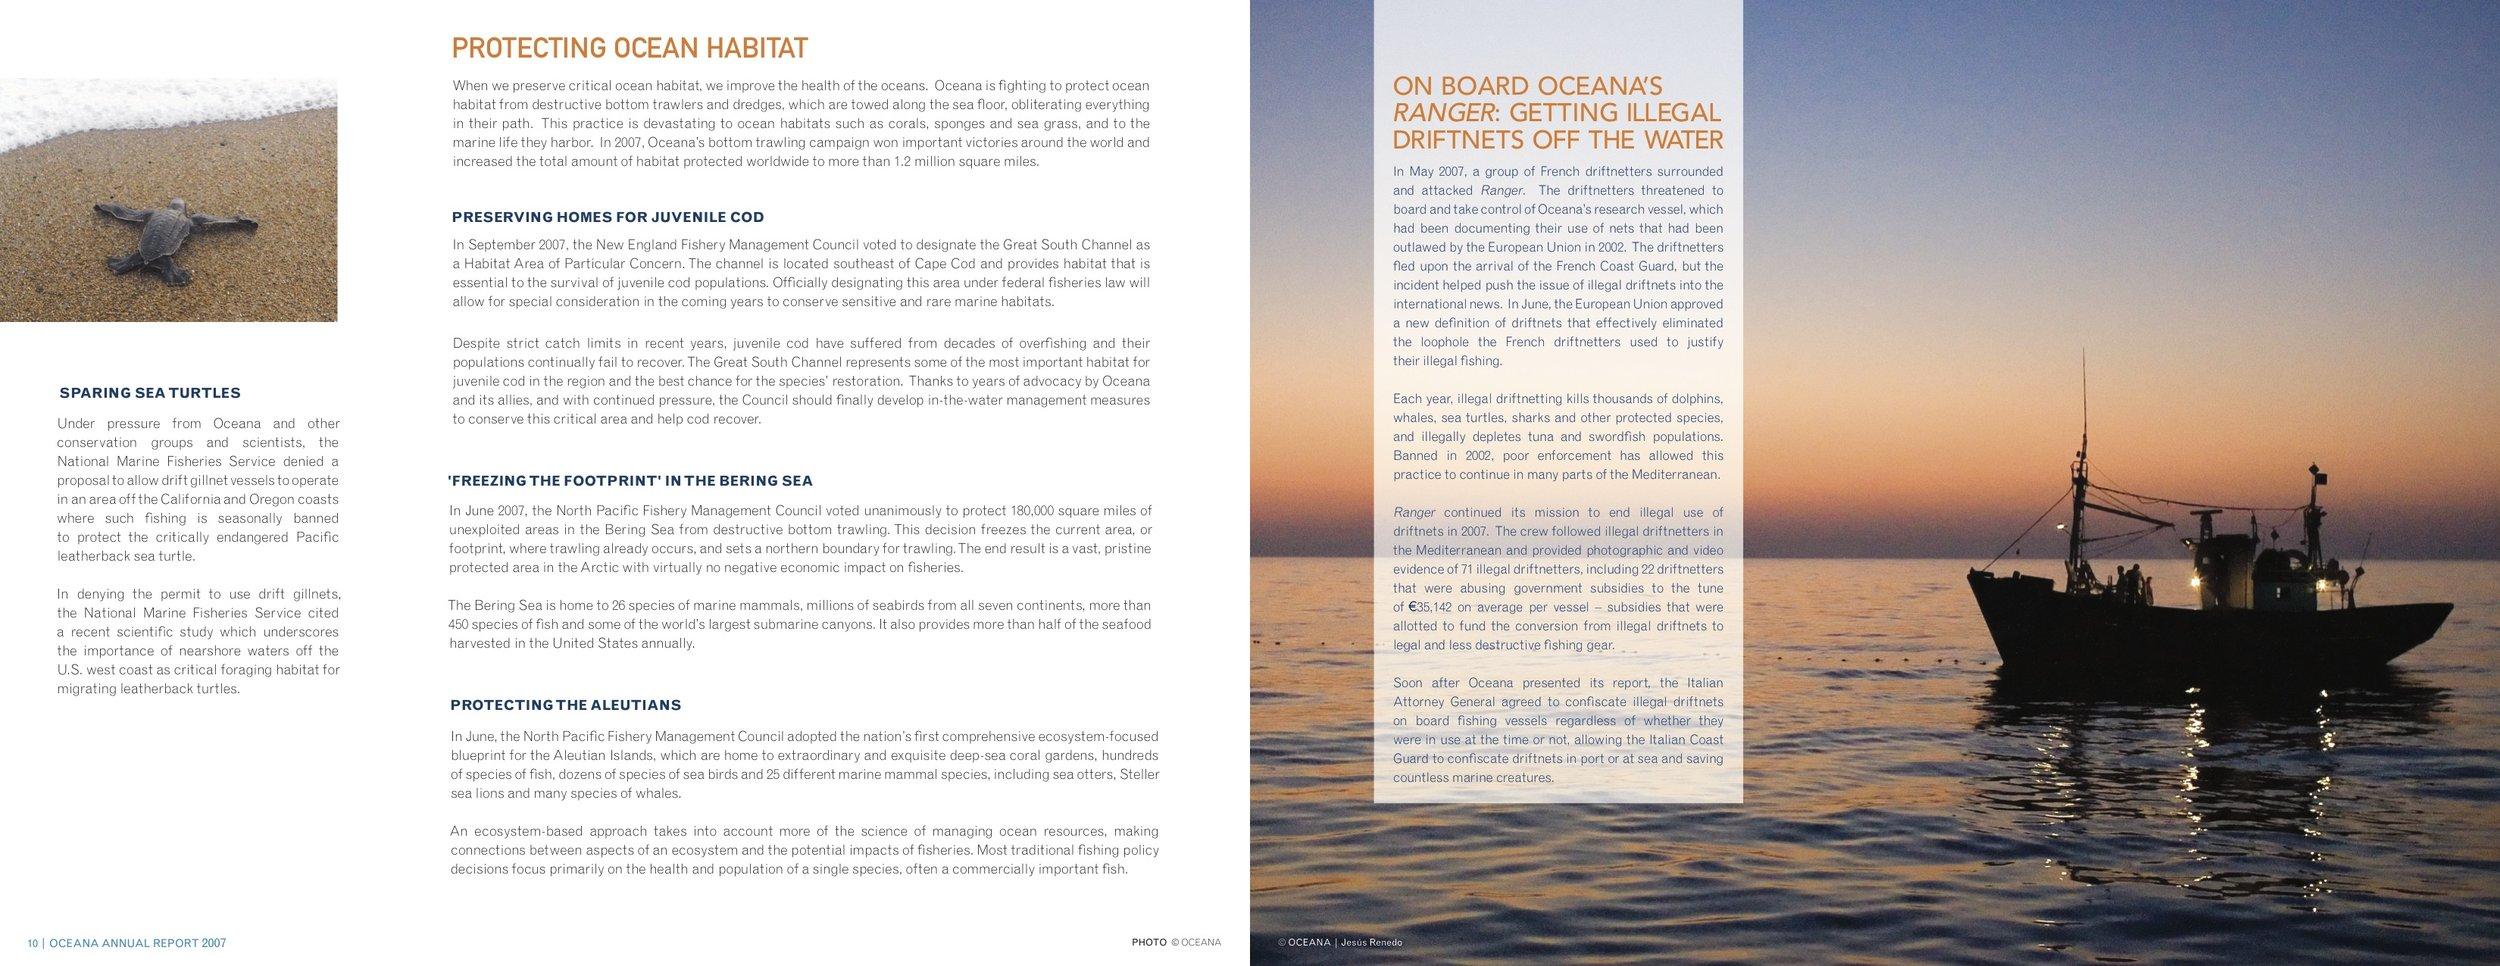 Oceana_annual_report07_FINAL6.jpg